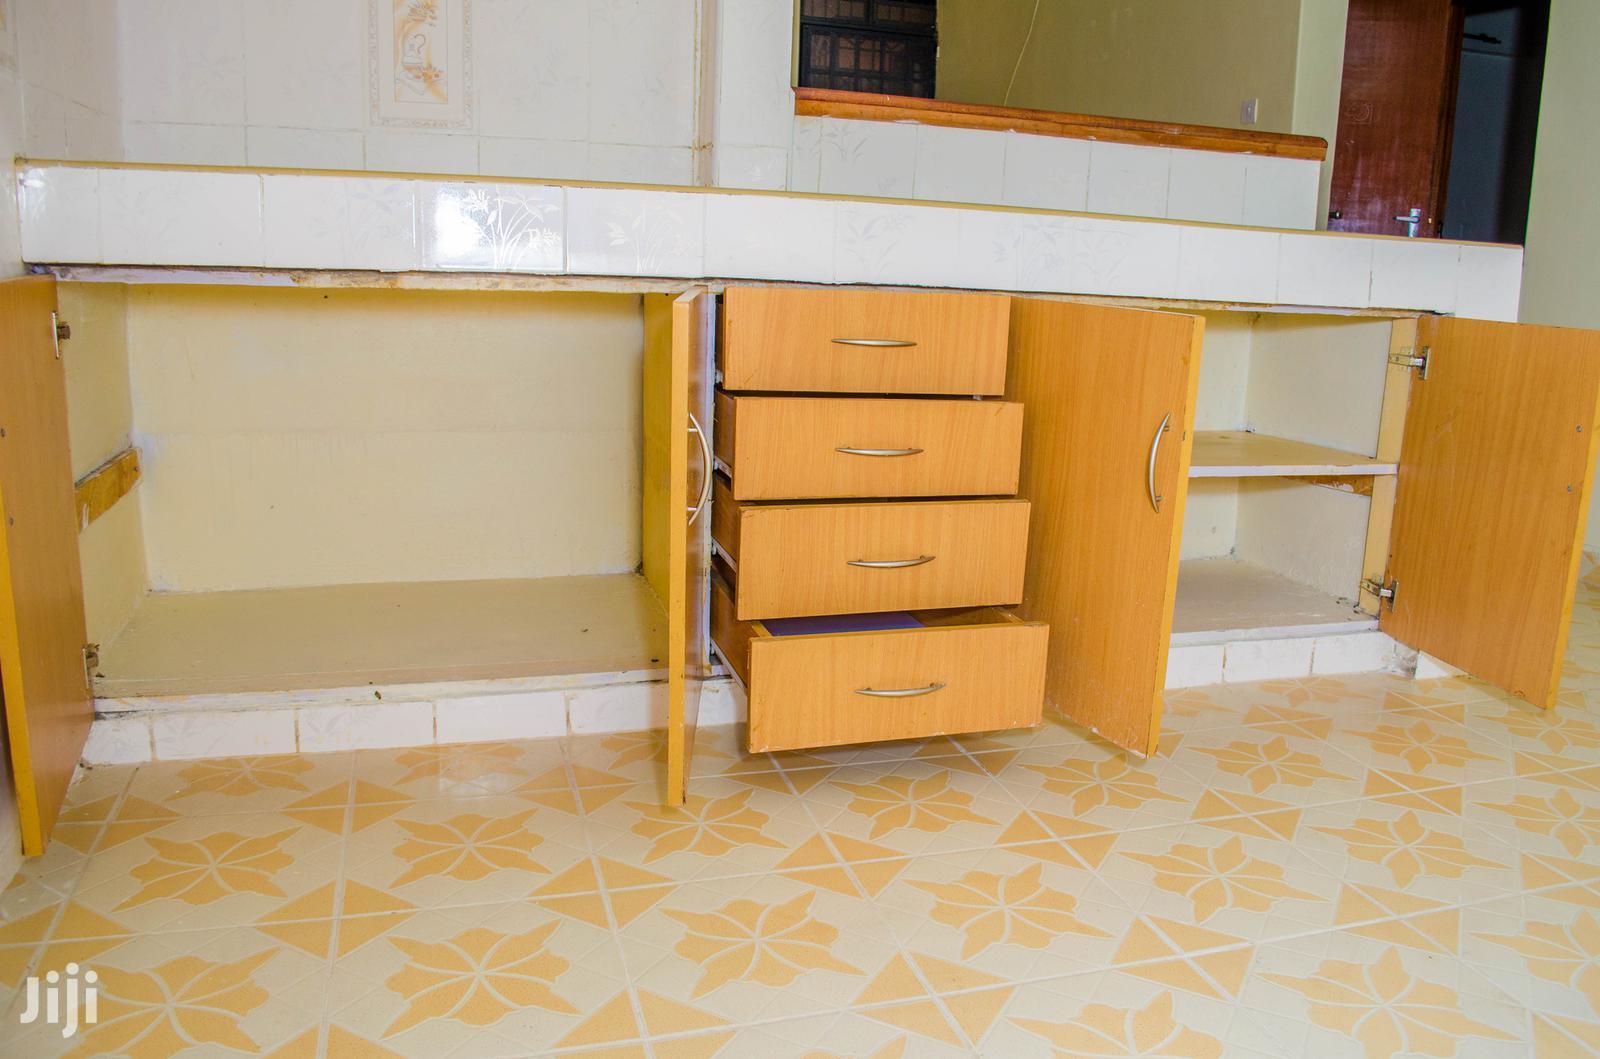 2 Bedroom Master Ensuite Apartment | Houses & Apartments For Rent for sale in Parklands/Highridge, Nairobi, Kenya